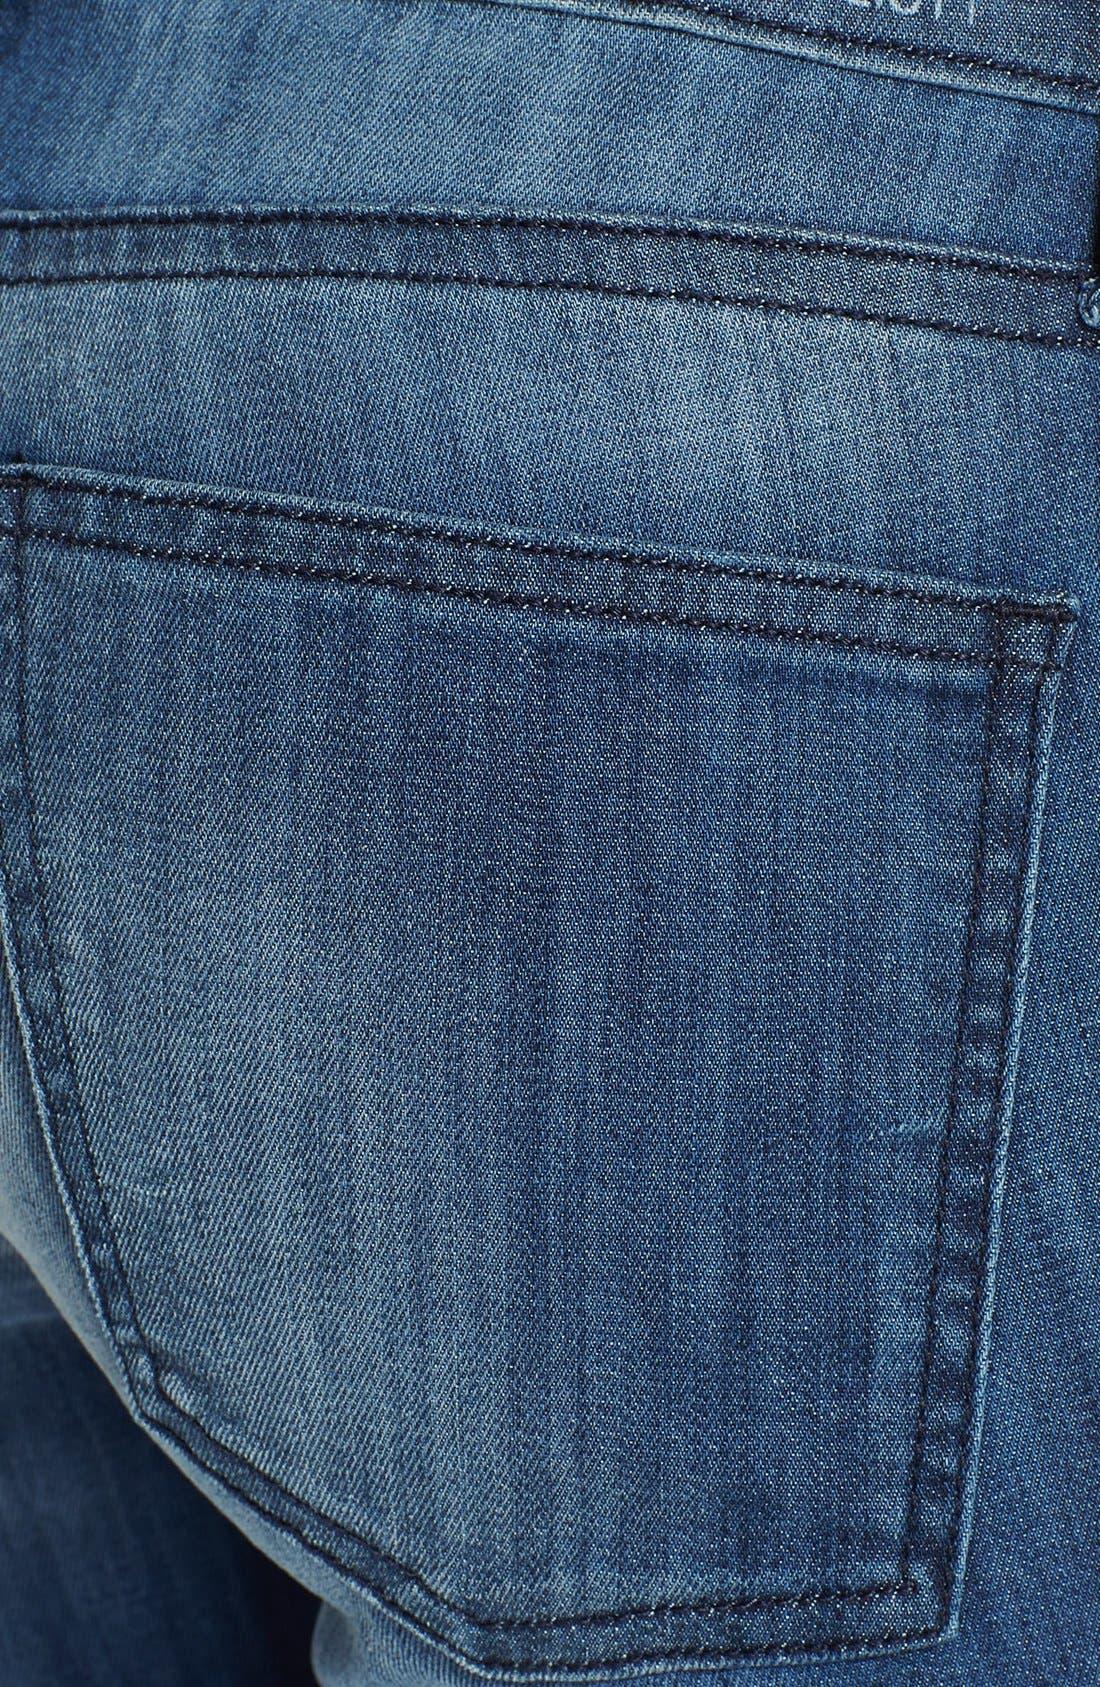 Alternate Image 3  - Current/Elliott 'The Stiletto' Skinny Jeans (Sunfade)